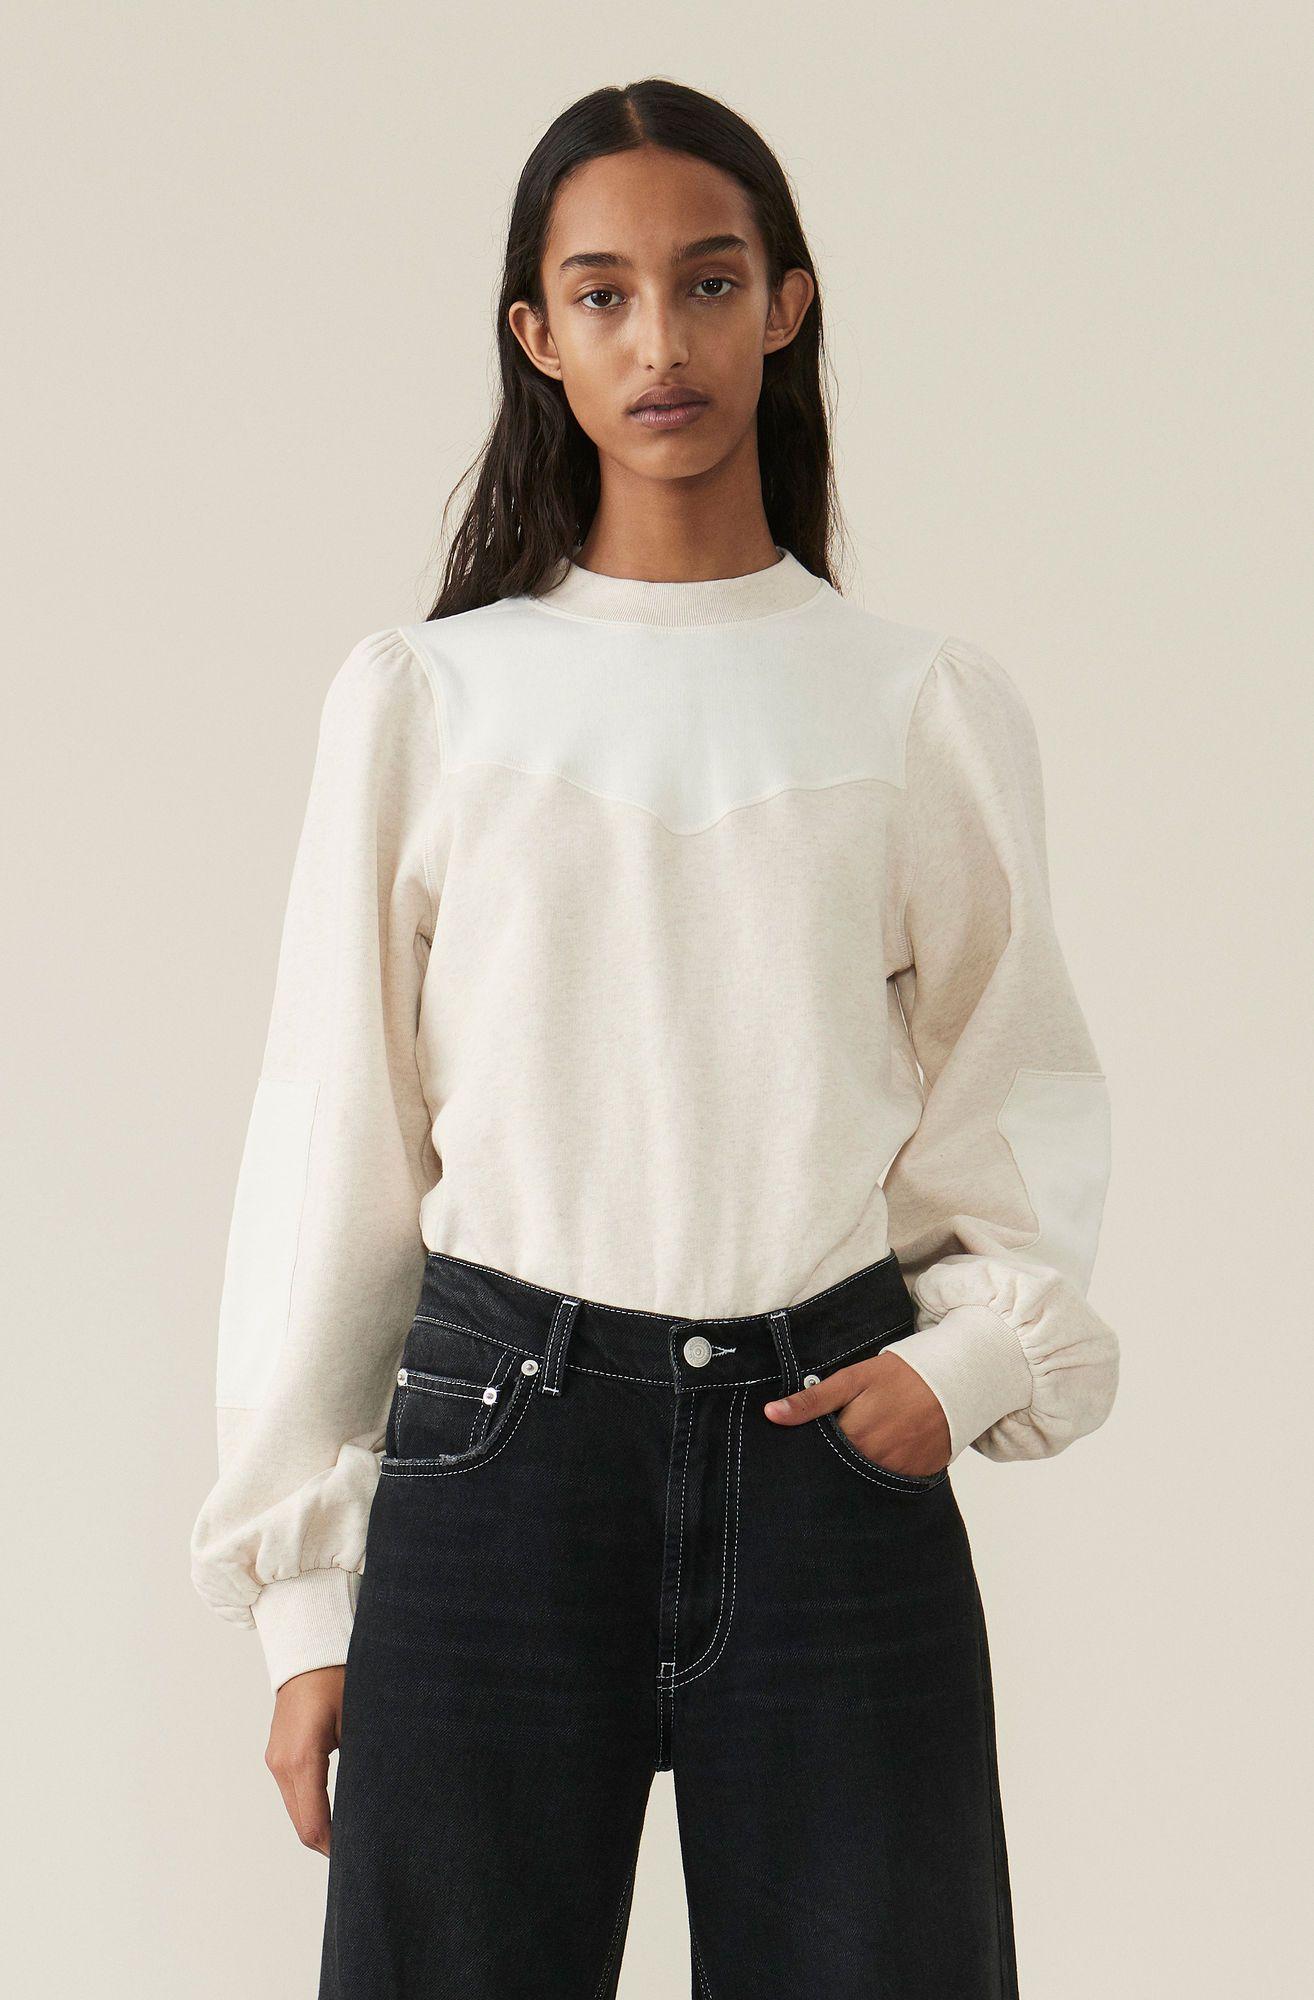 Isoli Puff Sweatshirt Tapioca Shopping Outfit Clothes Sweatshirts [ 2000 x 1314 Pixel ]